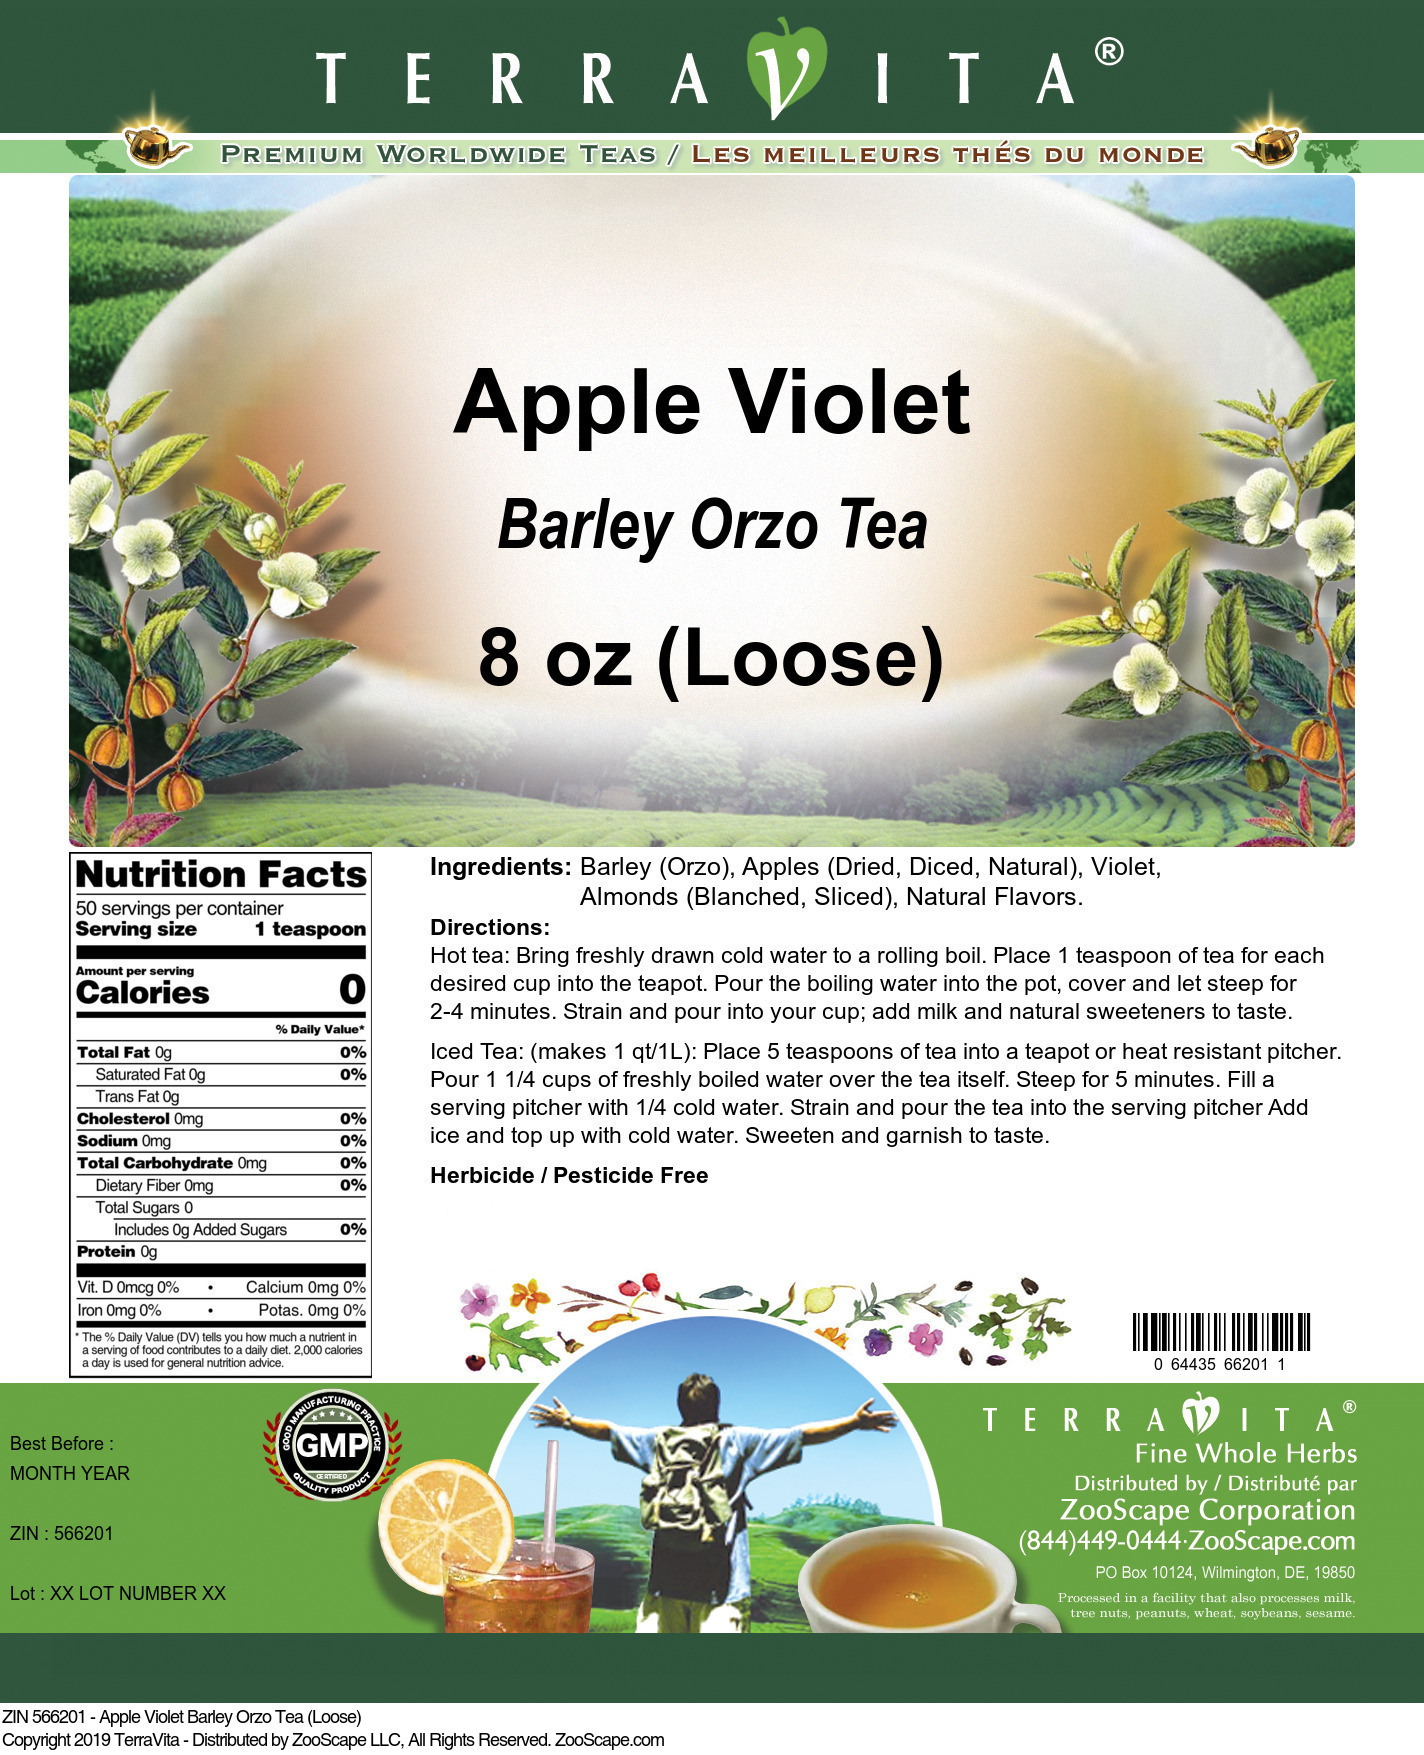 Apple Violet Barley Orzo